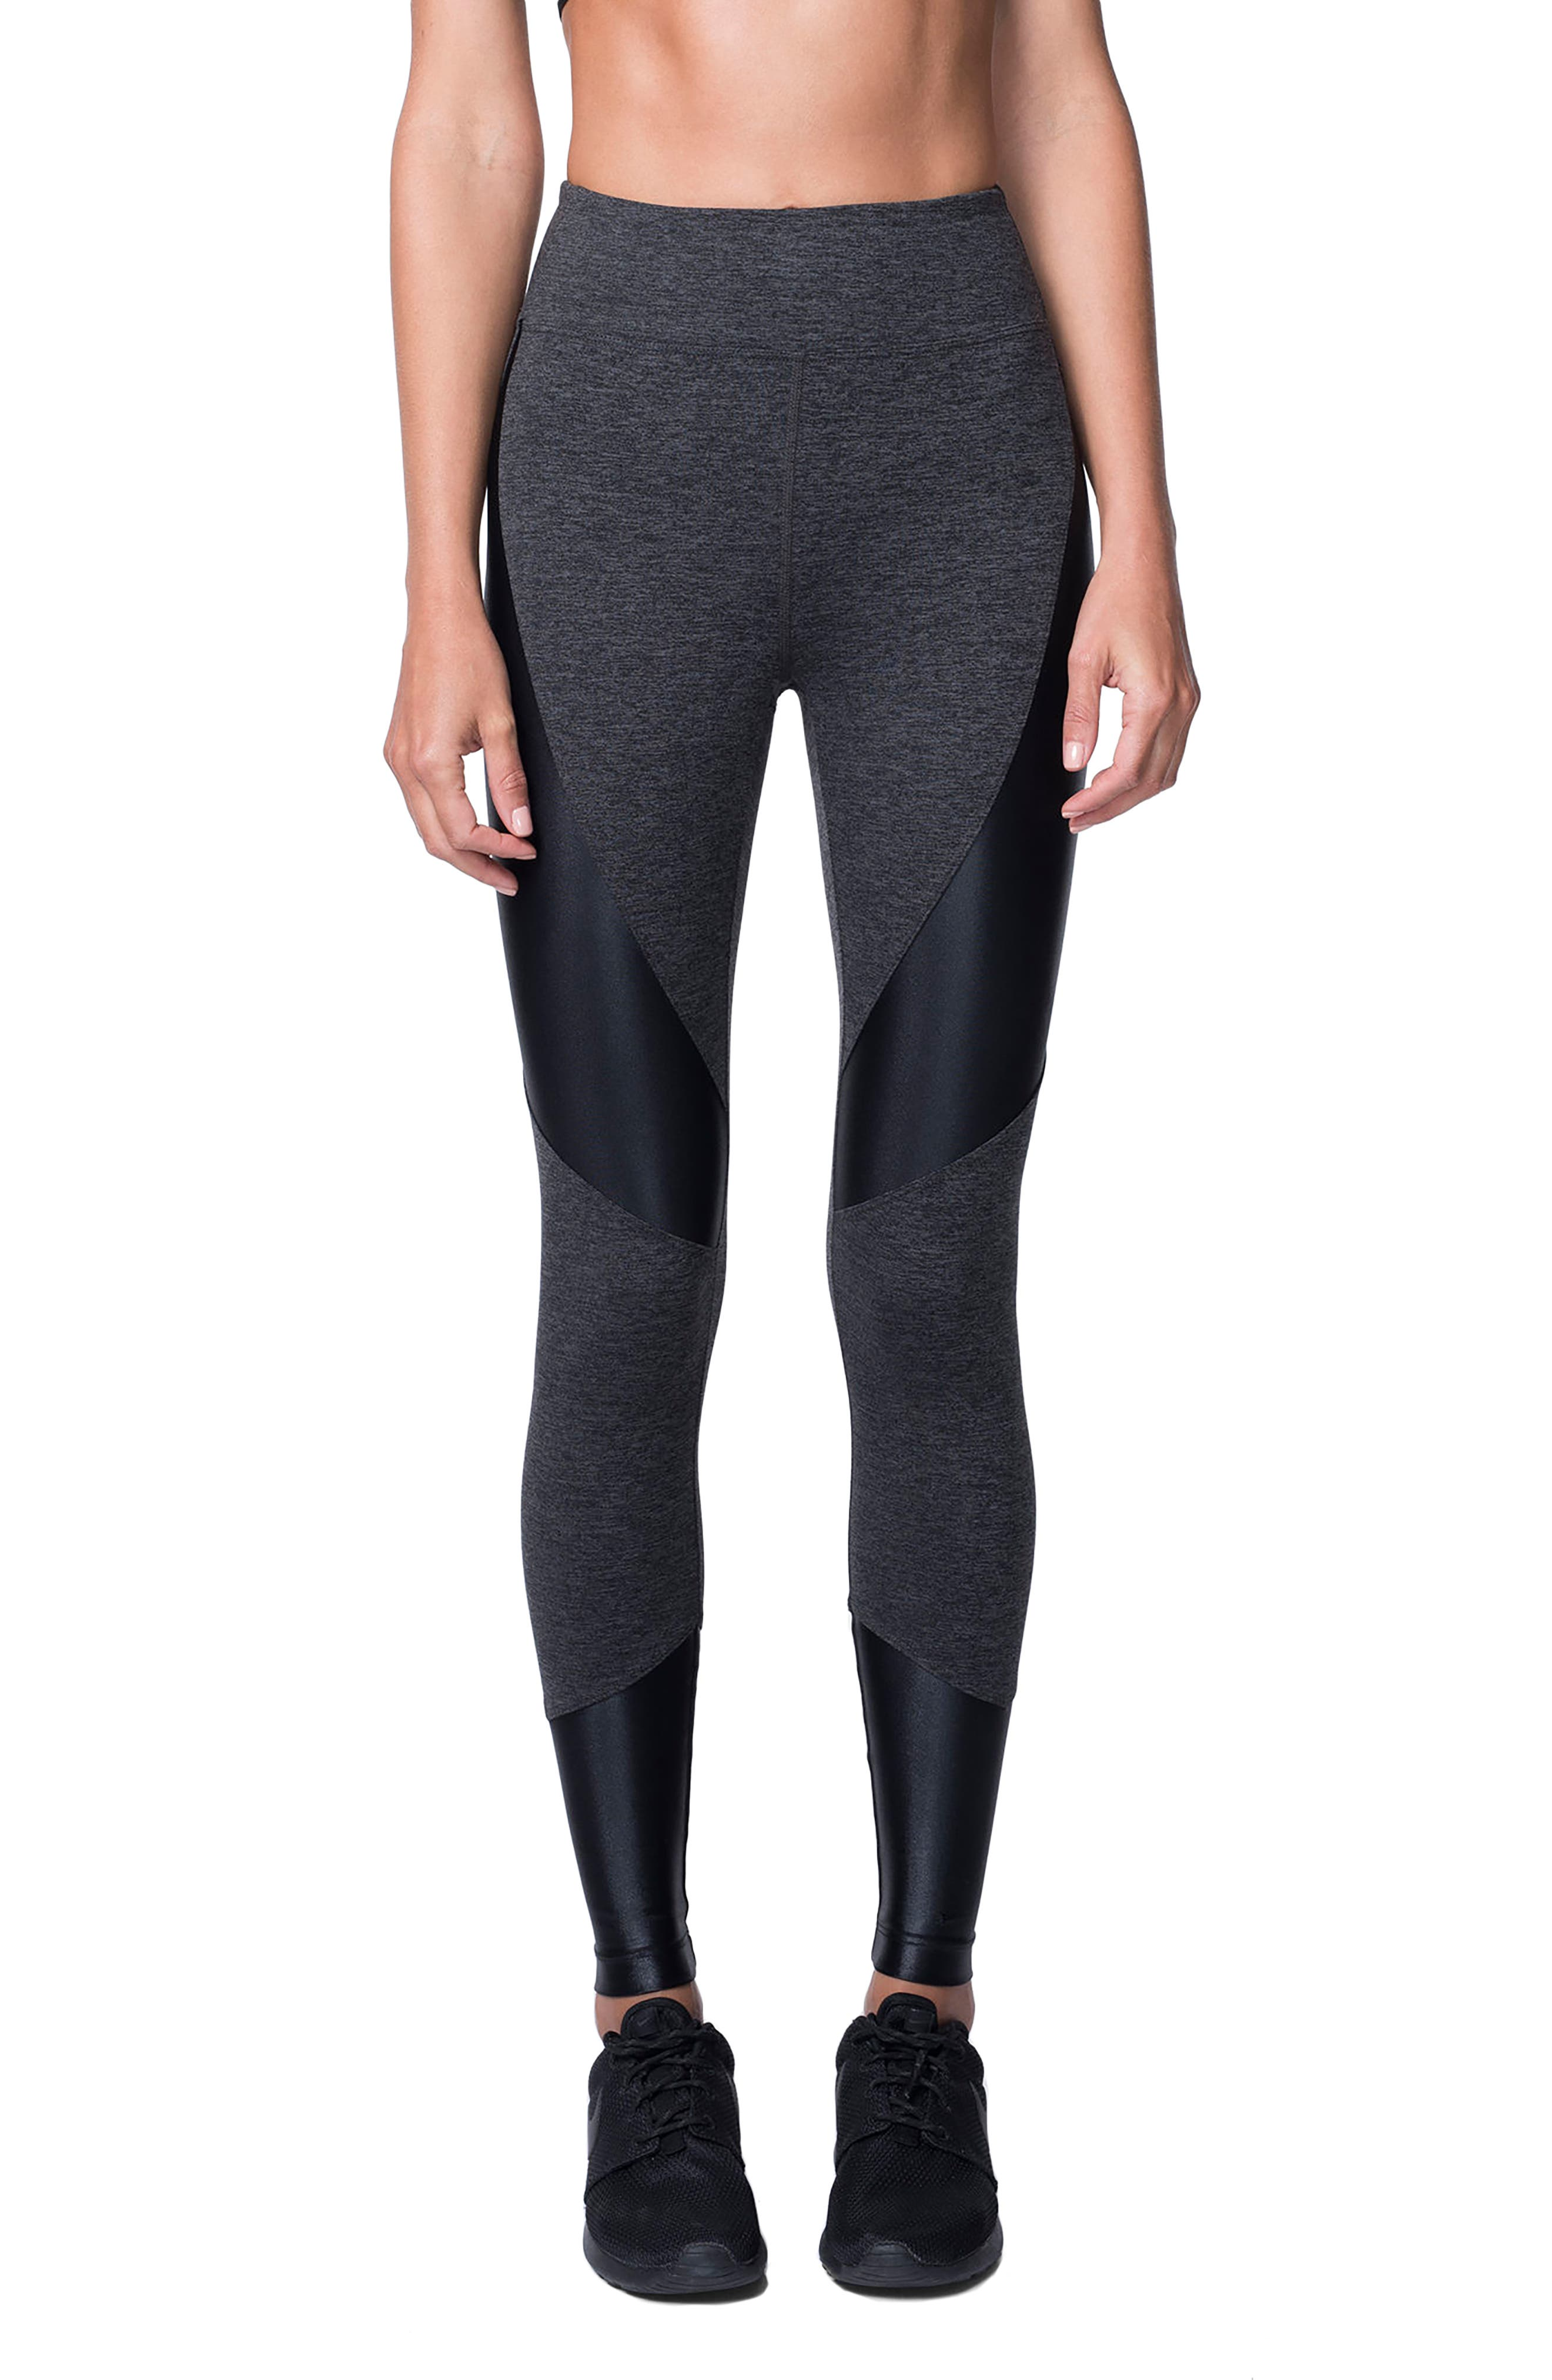 Forge Leggings,                         Main,                         color, Dark Heather Grey/Black